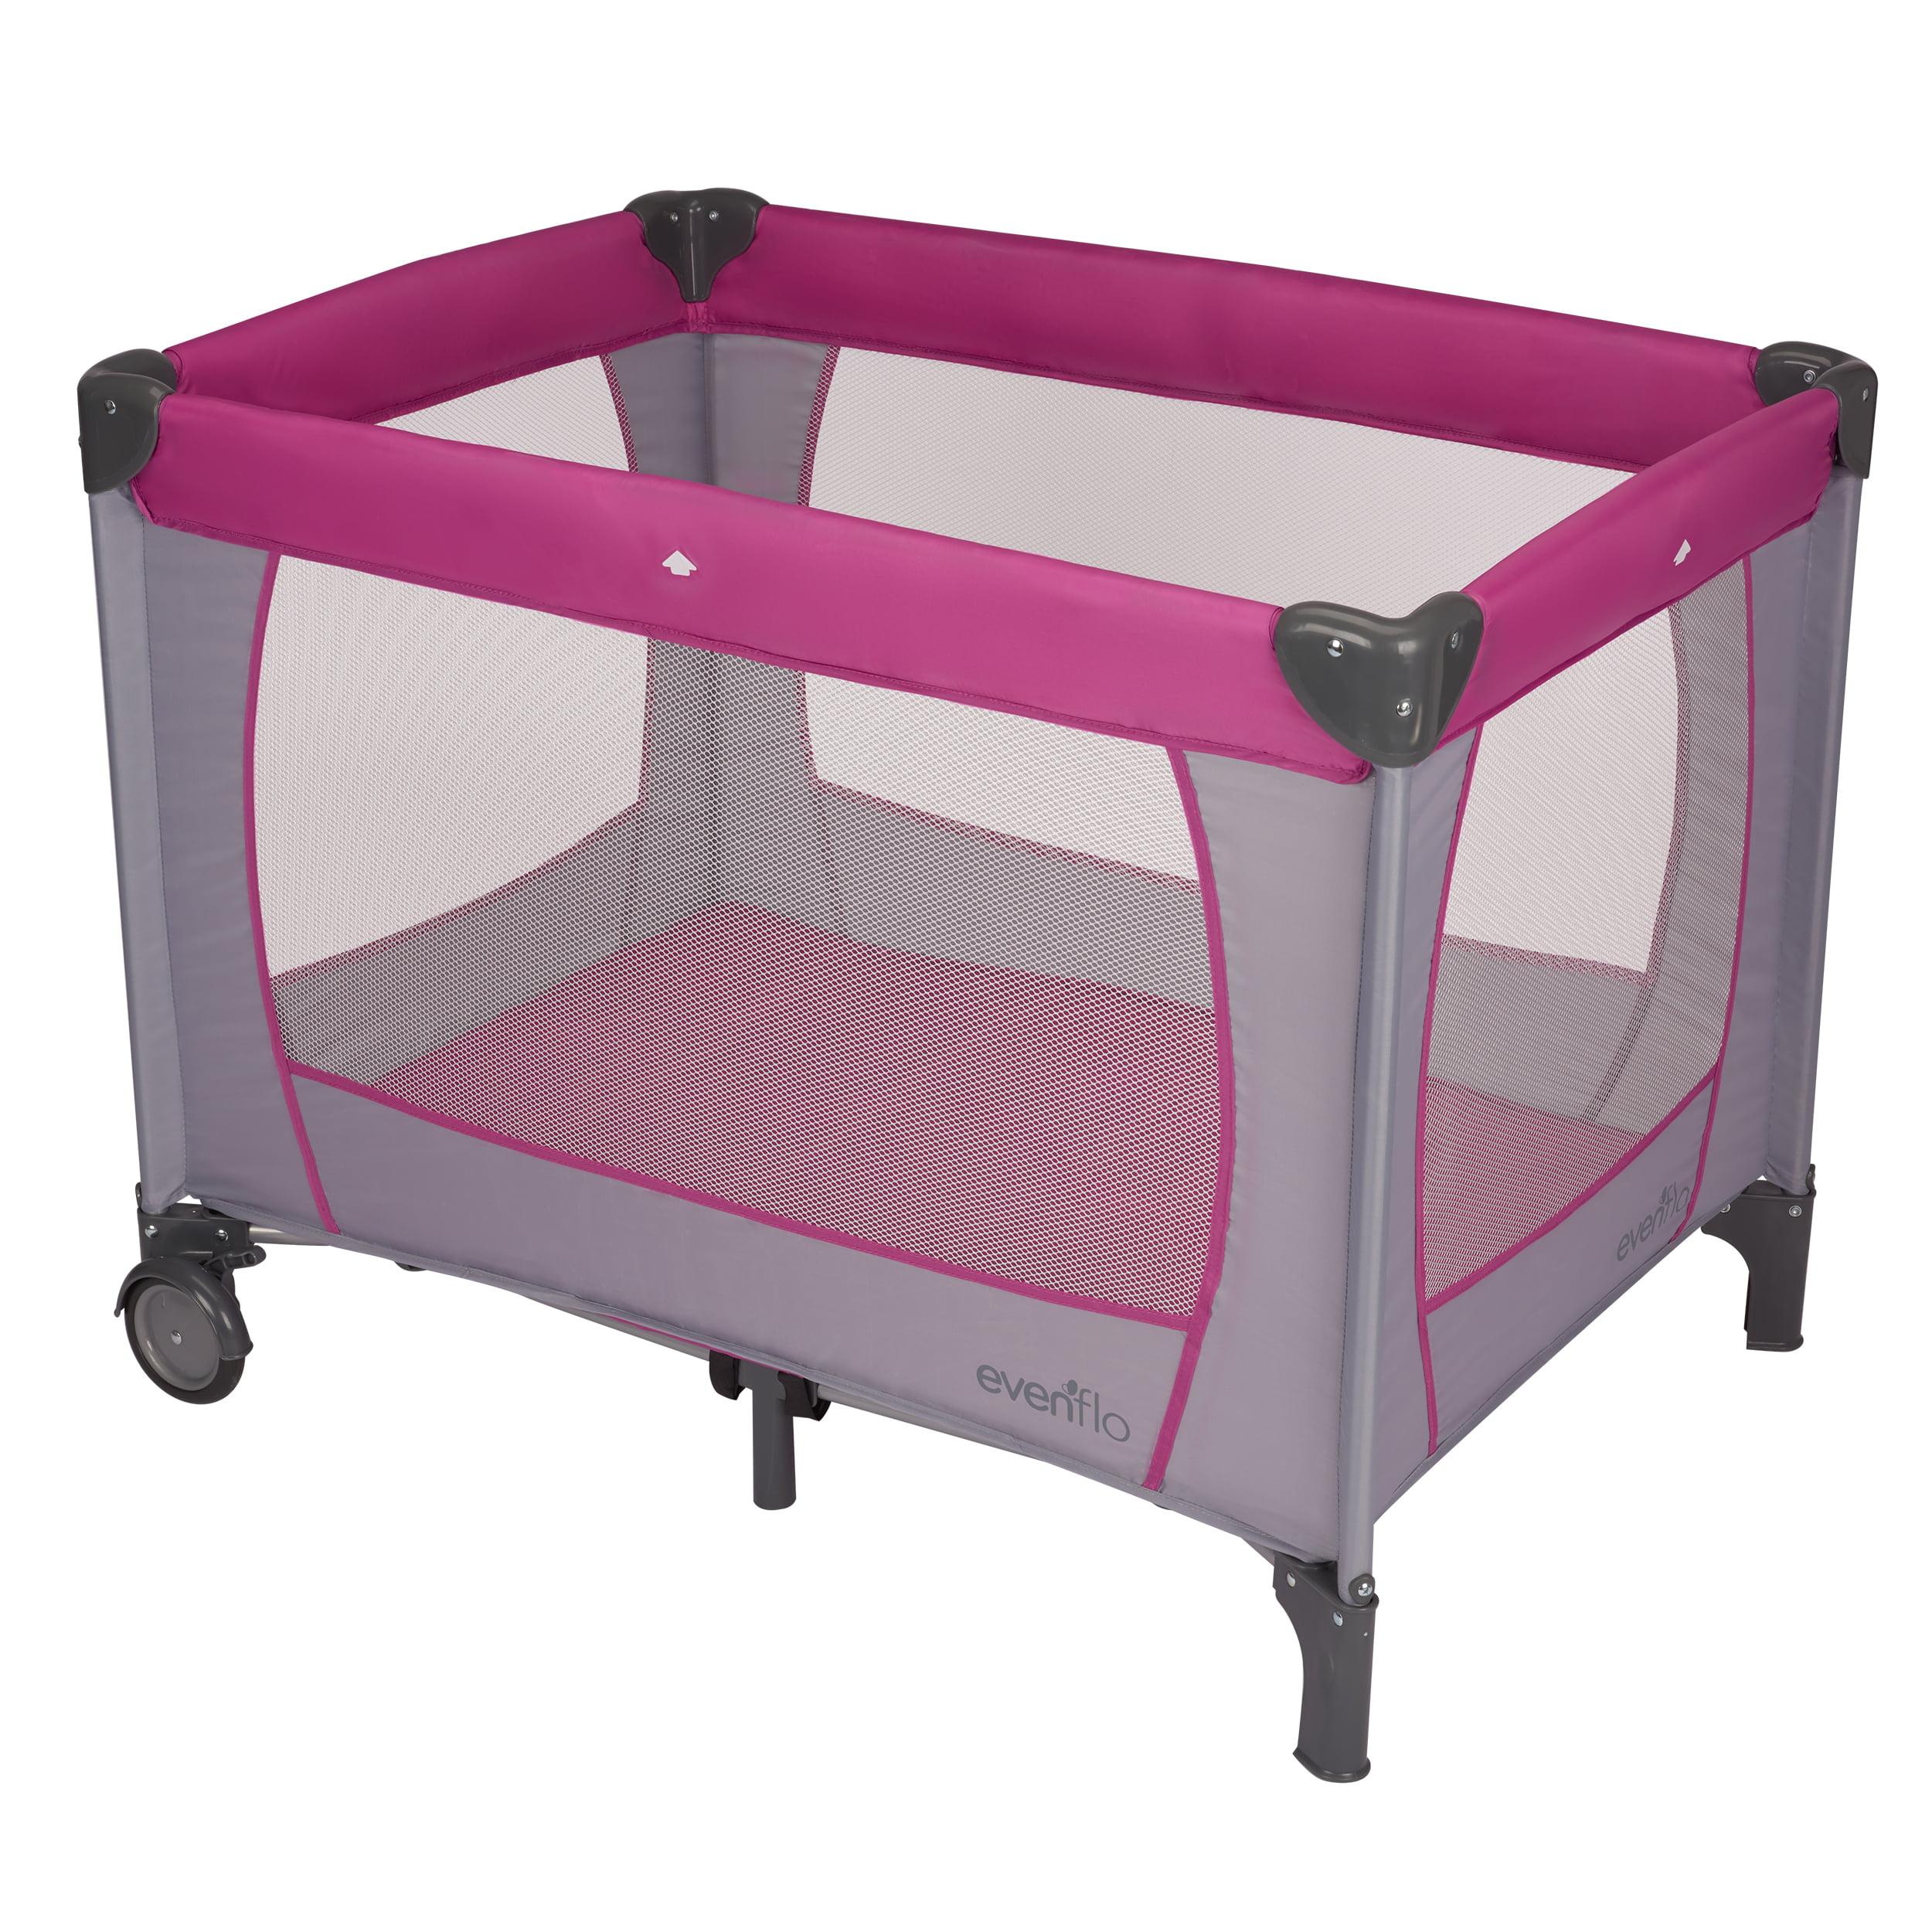 Evenflo Portable Babysuite Classic Playard, Purple Orchid